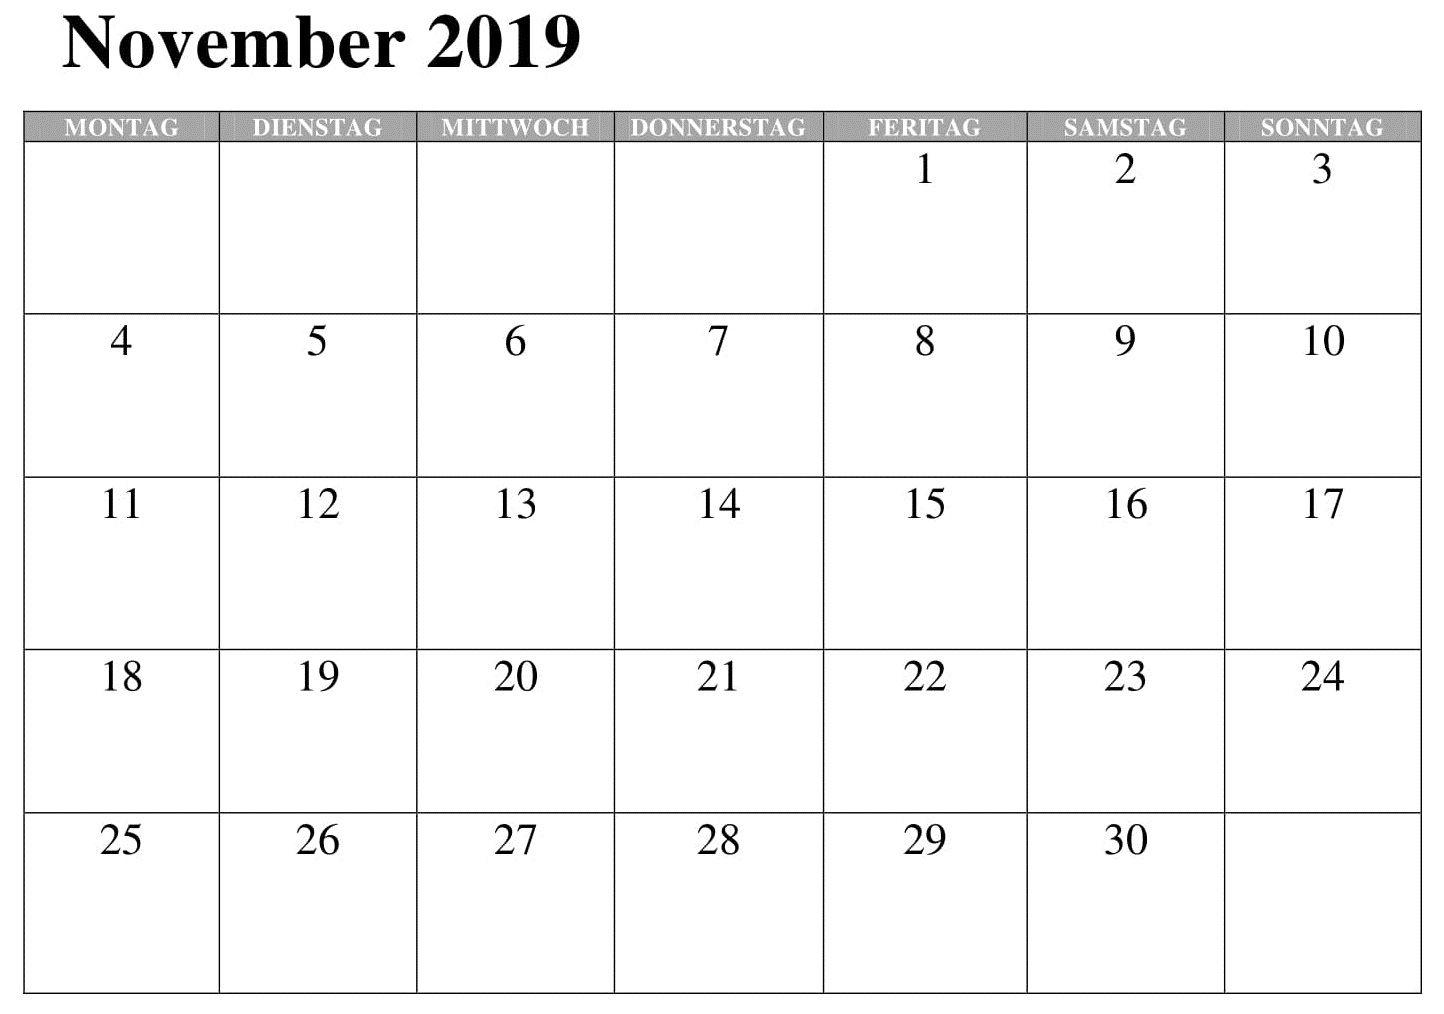 November 2019 Kalender